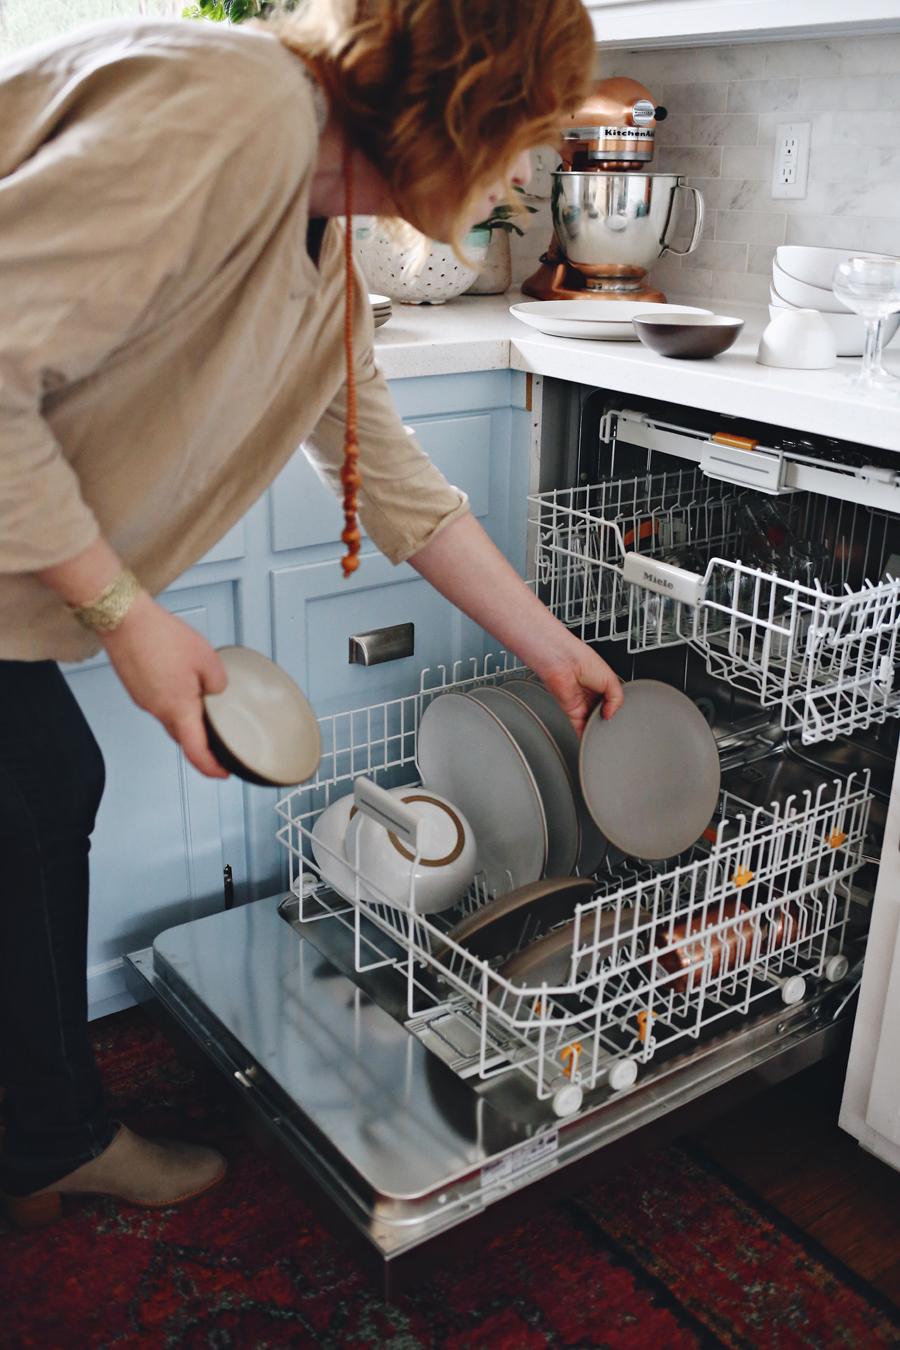 miele-futura-dishwasher-dine-x-design